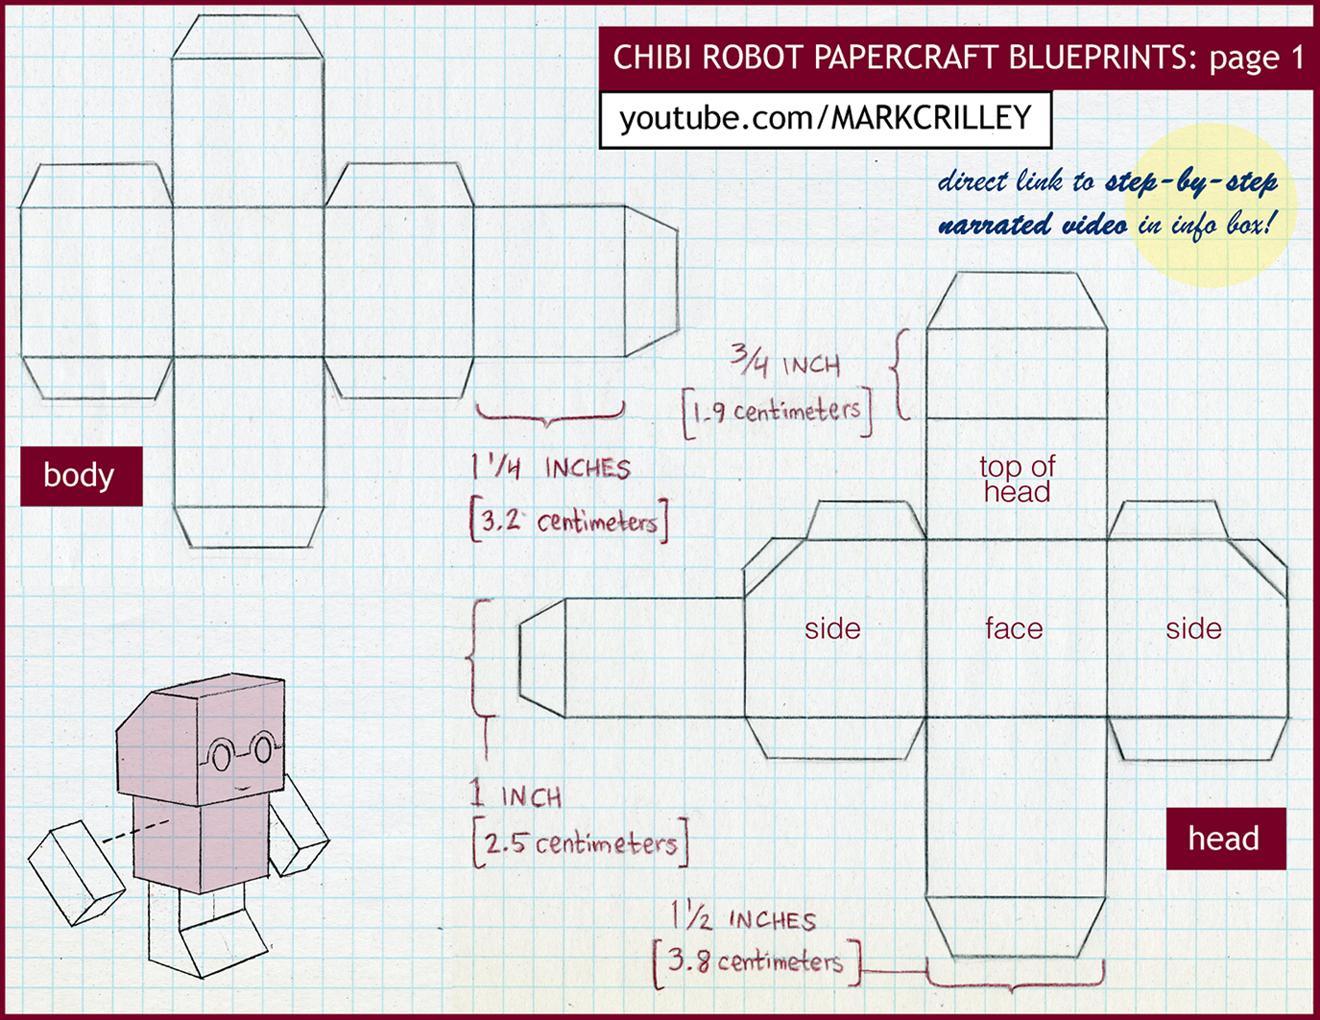 Chibi Robot Papercraft Blue Print 1